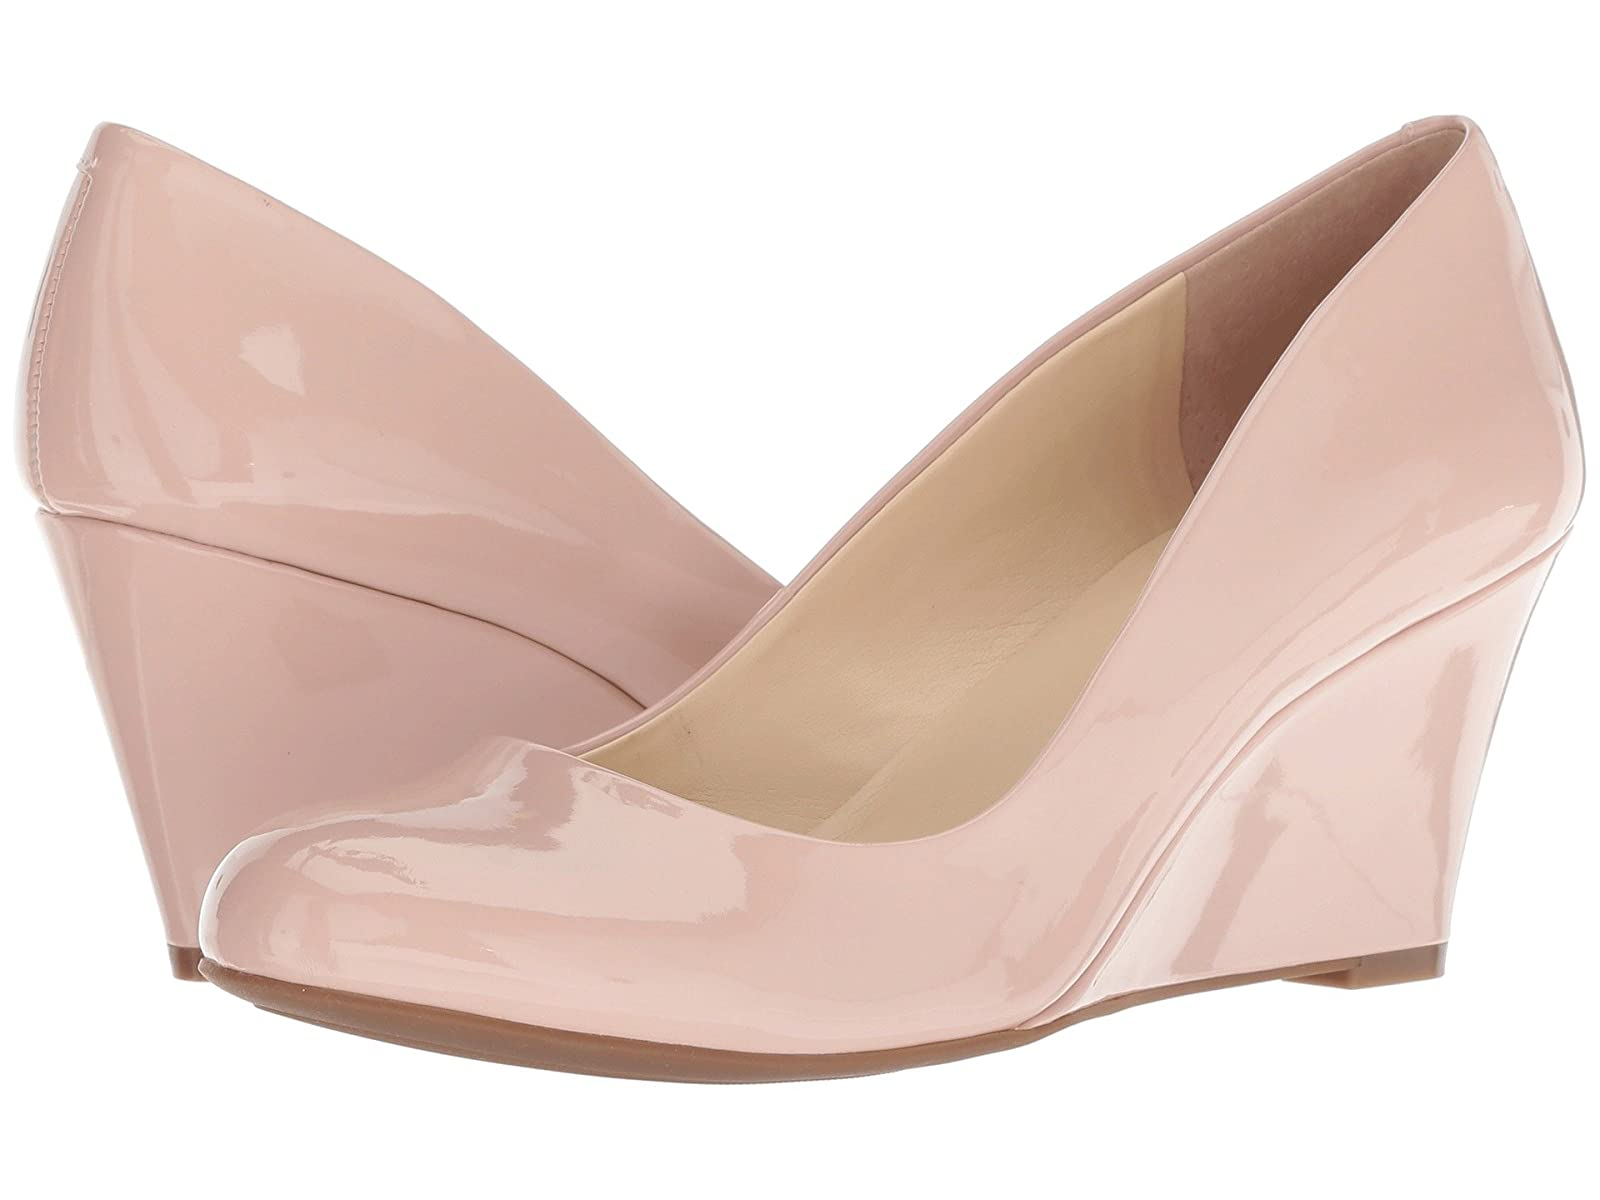 Jessica Simpson Sampson - ExclusiveAtmospheric grades have affordable shoes